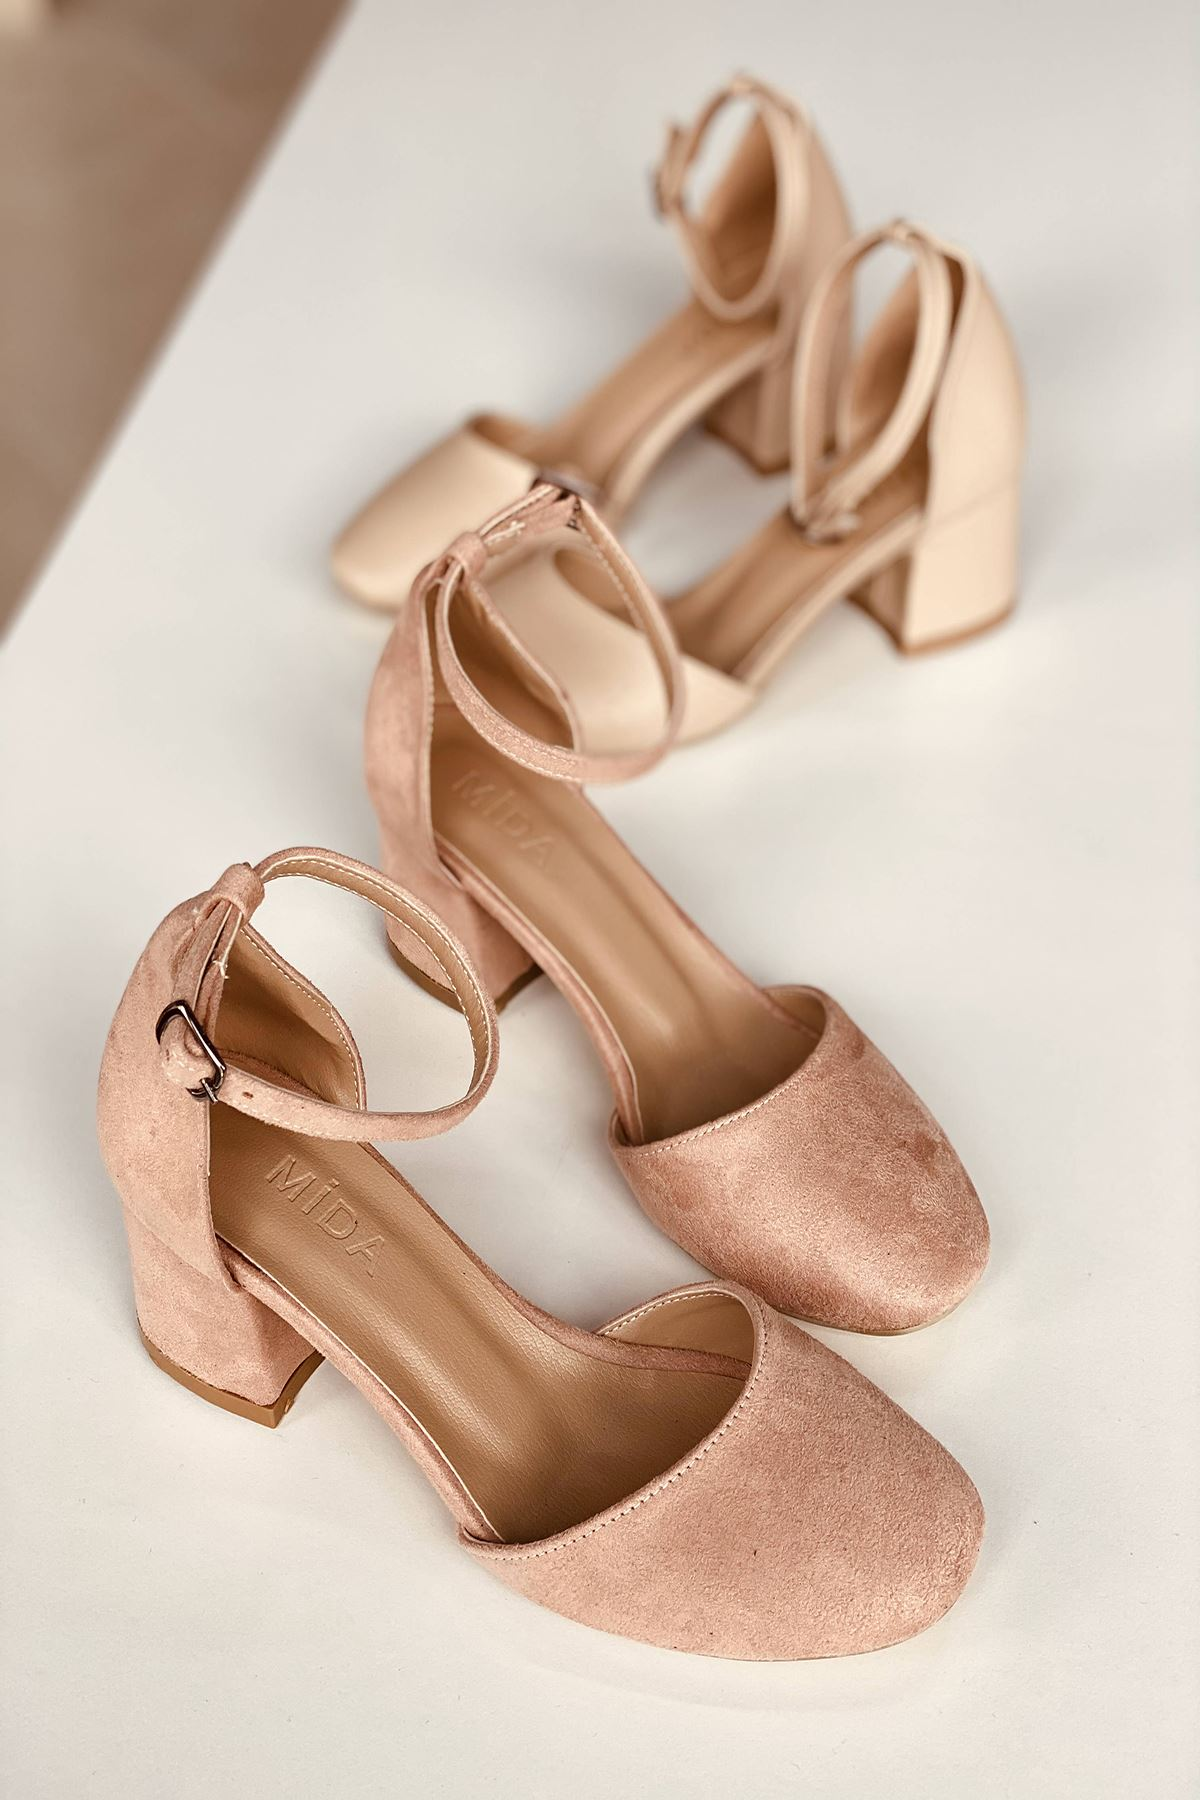 Y202 Pudra Süet Topuklu Ayakkabı